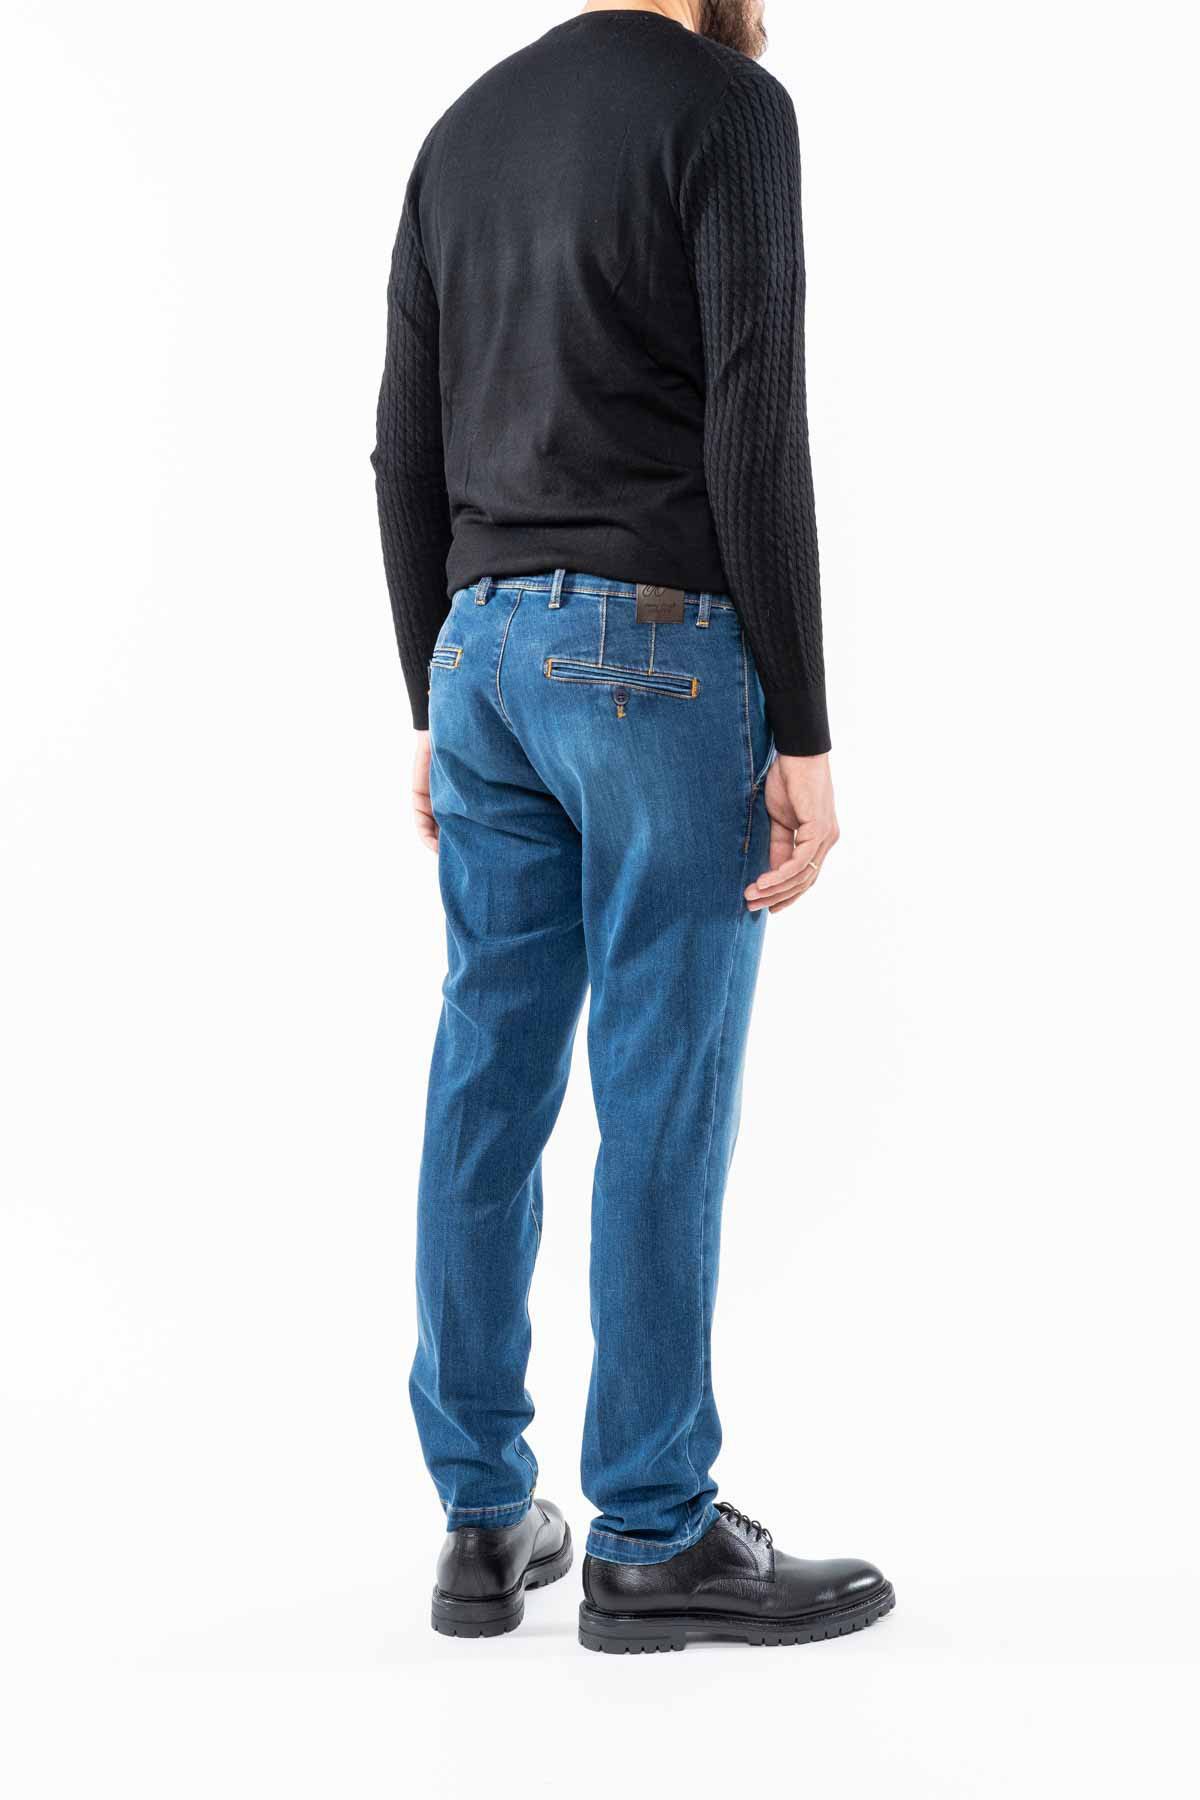 jeans,chiaro